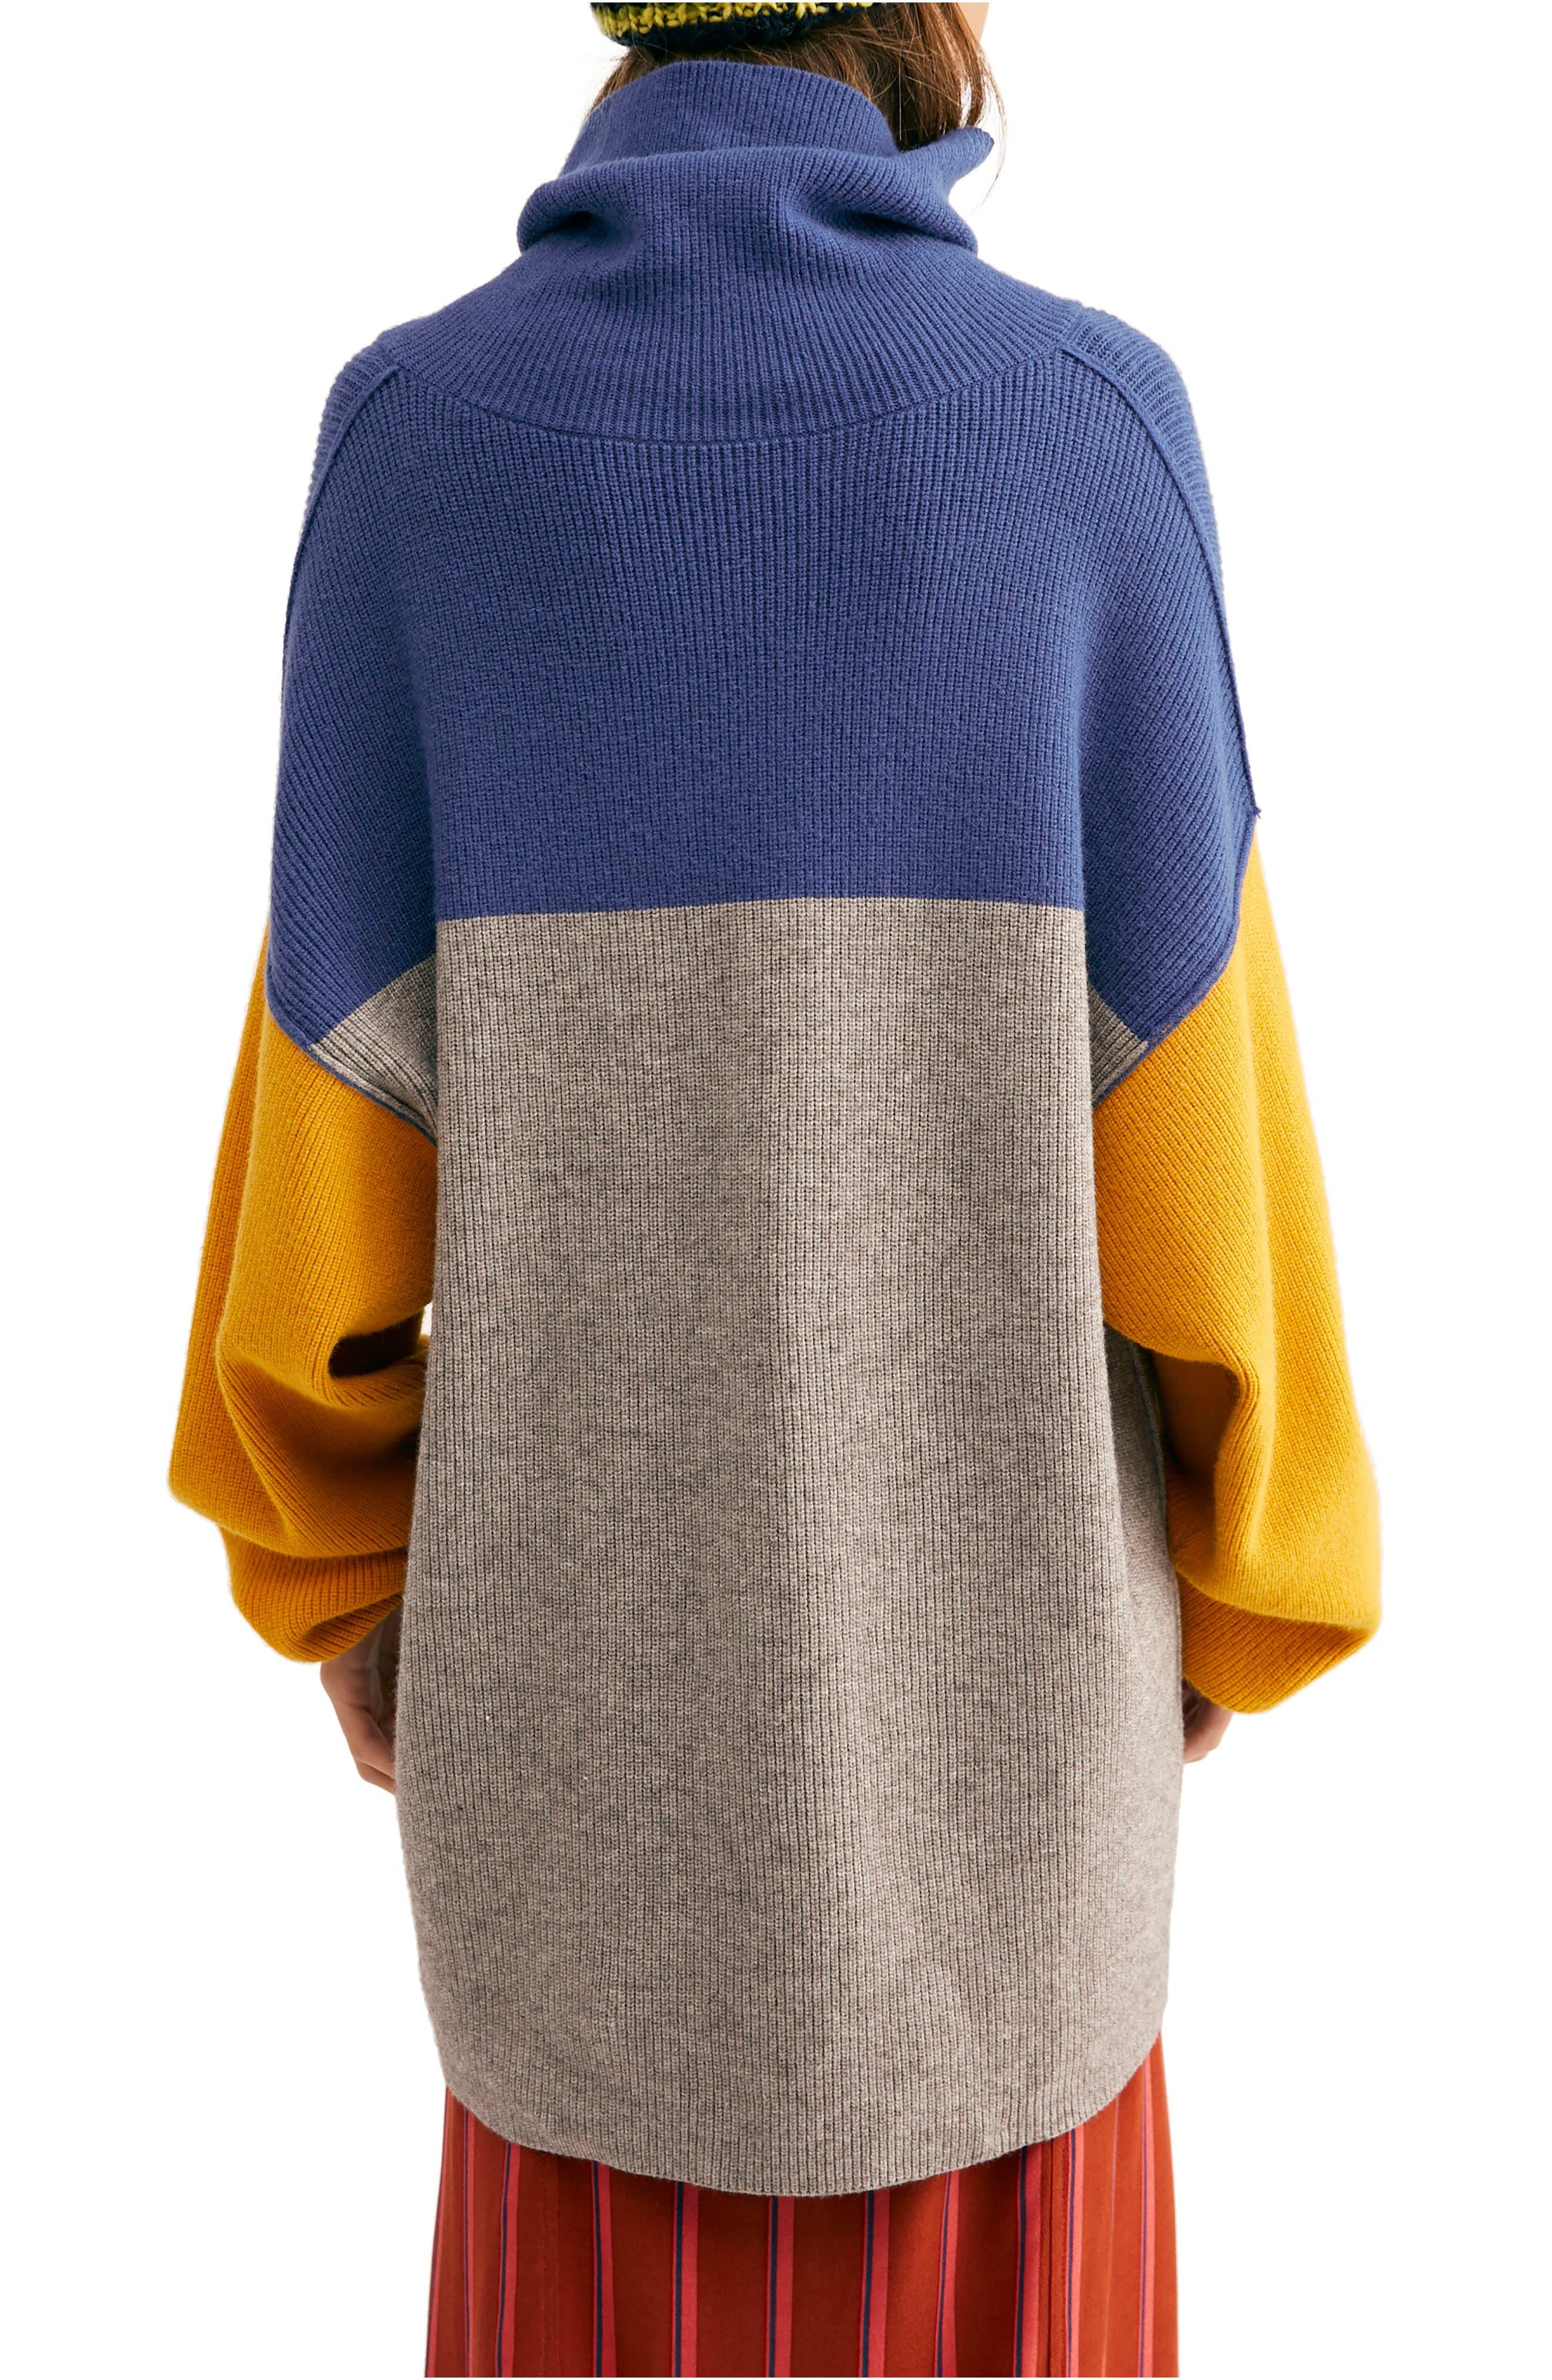 FREE PEOPLE, Colorblock Turtleneck Sweater, Alternate thumbnail 2, color, 400